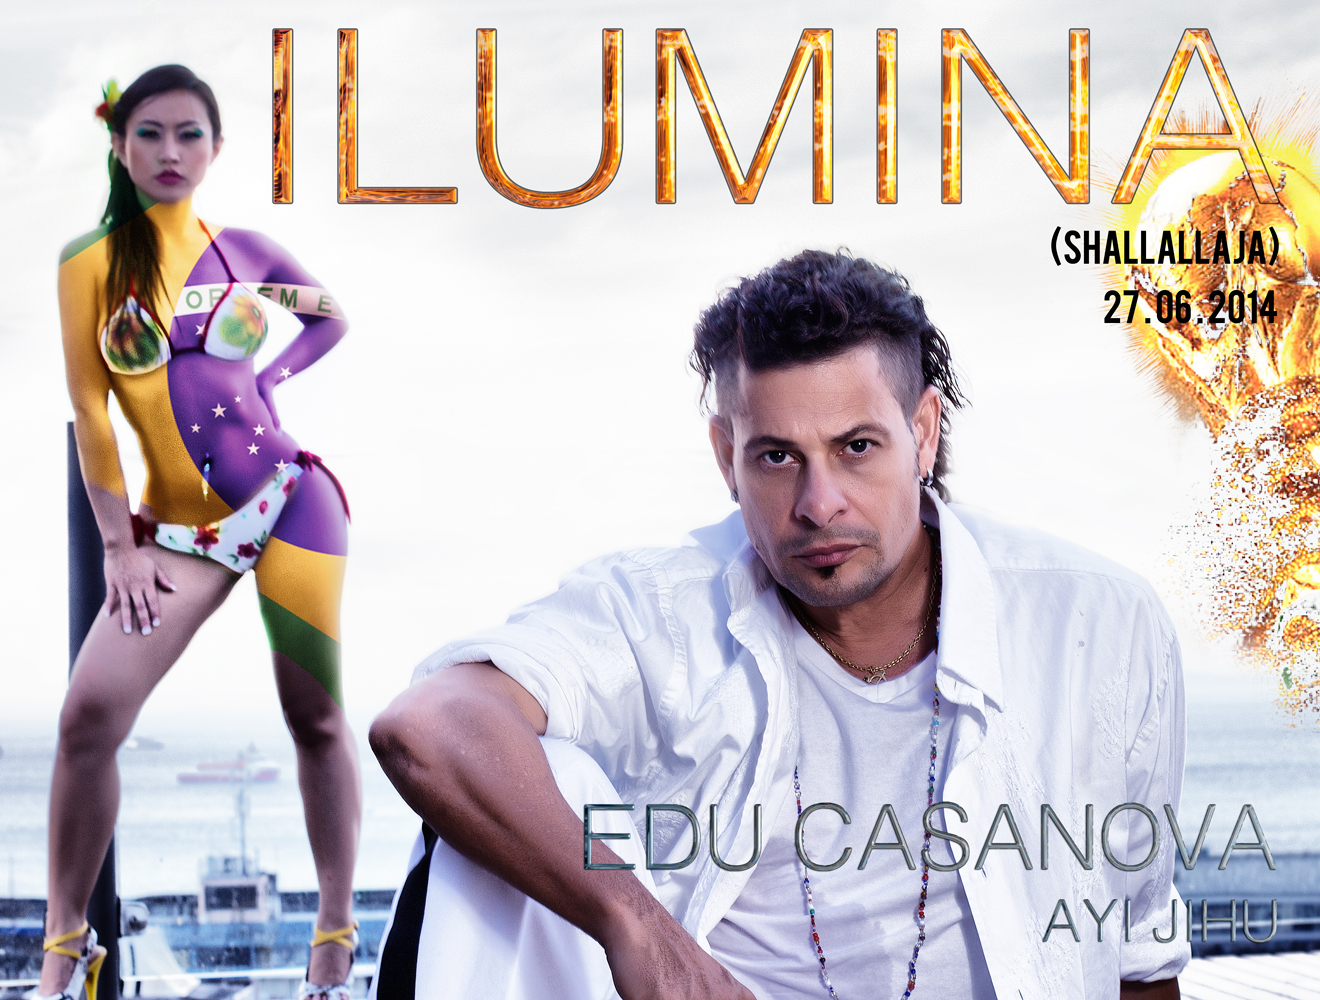 Edu Casanova with Chinese star Ayi JIhu world cup Anthem Ilumina